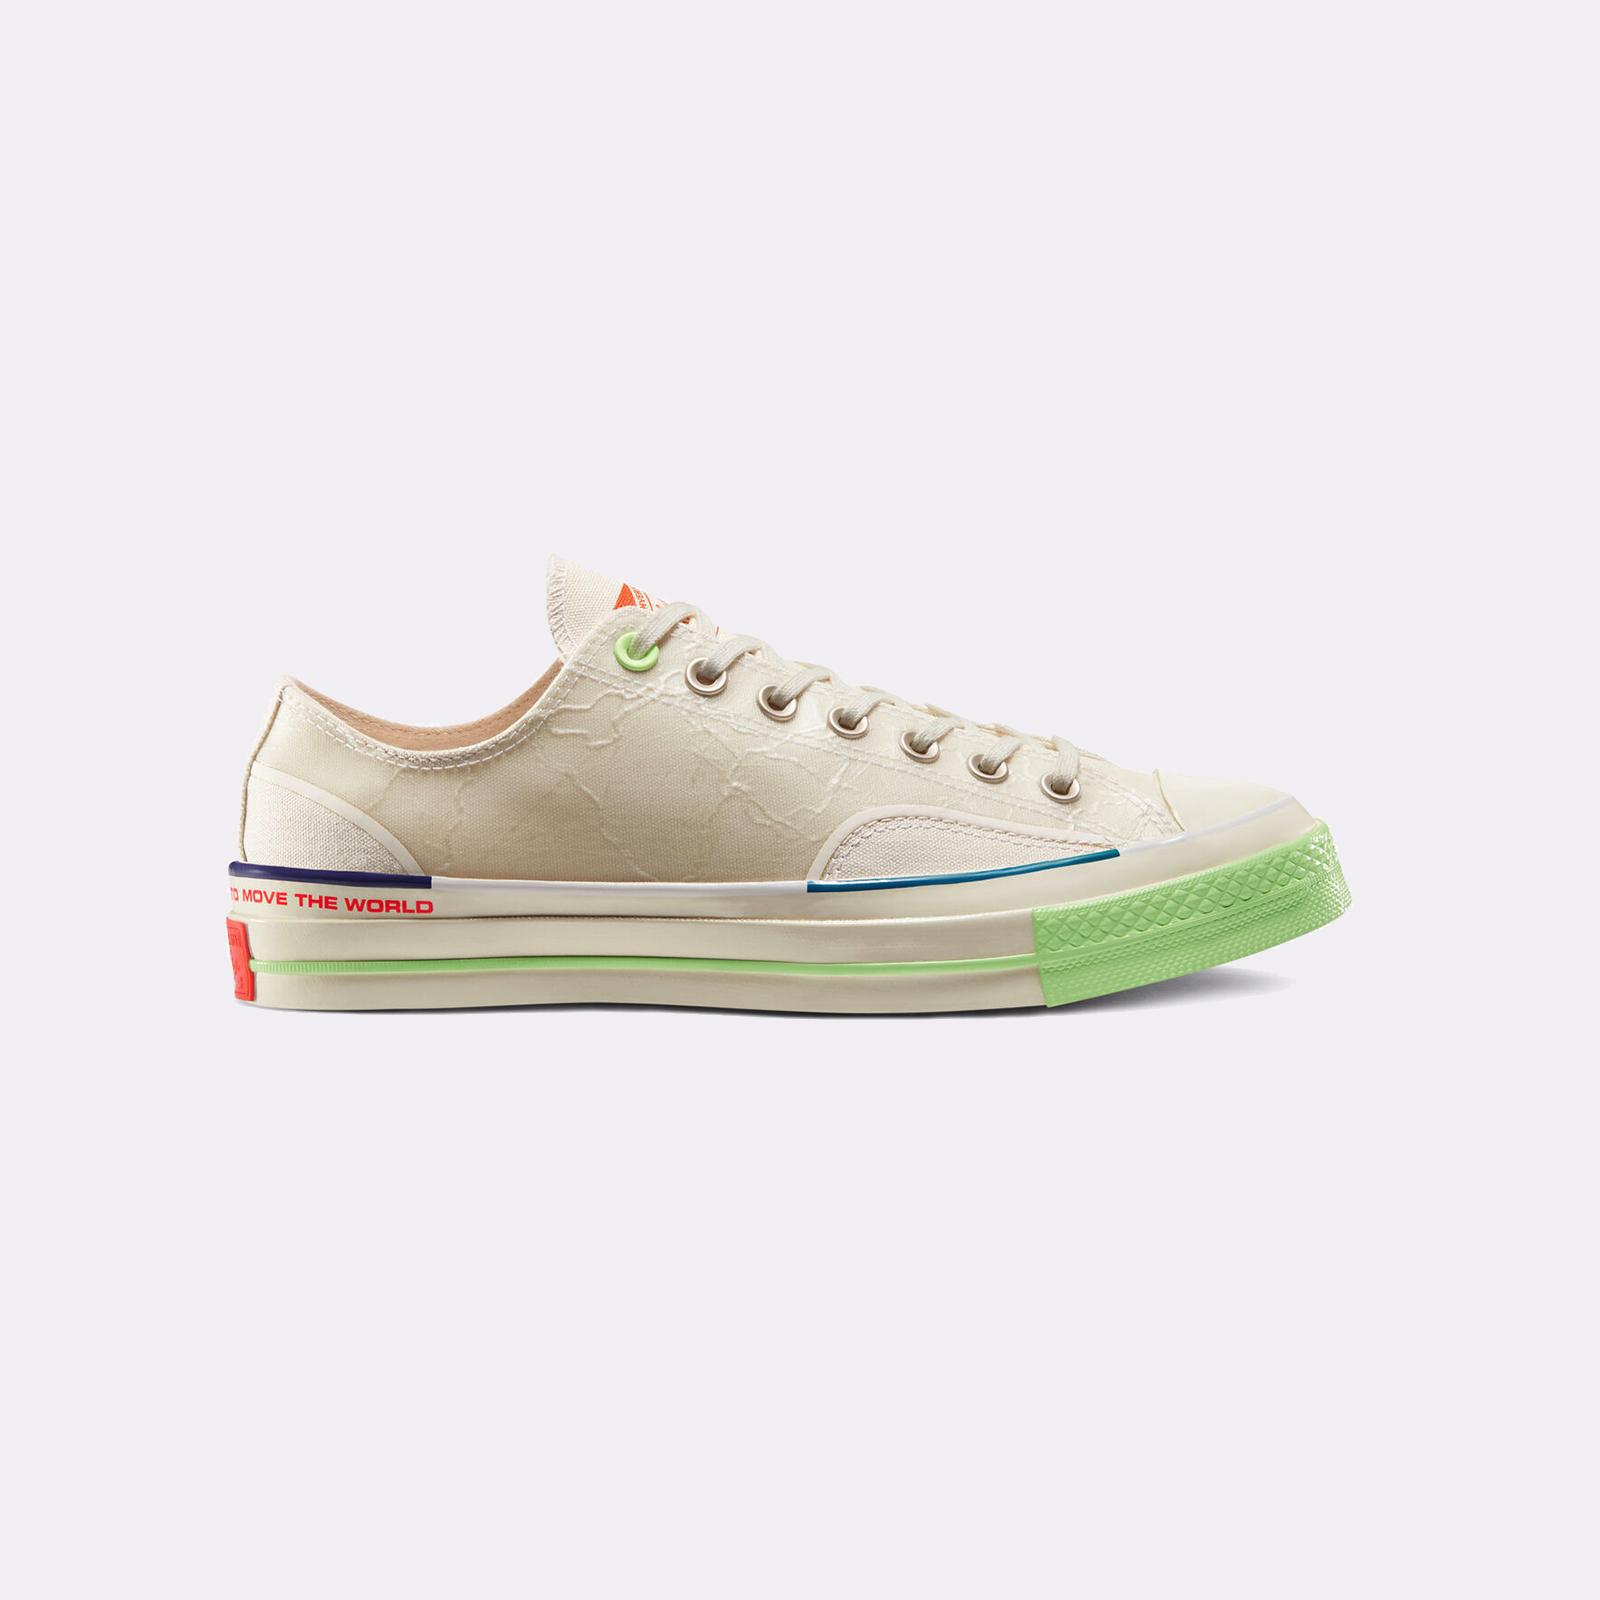 Converse Chuck 70s Ox x Pigalle 165748c Sneakersnstuff